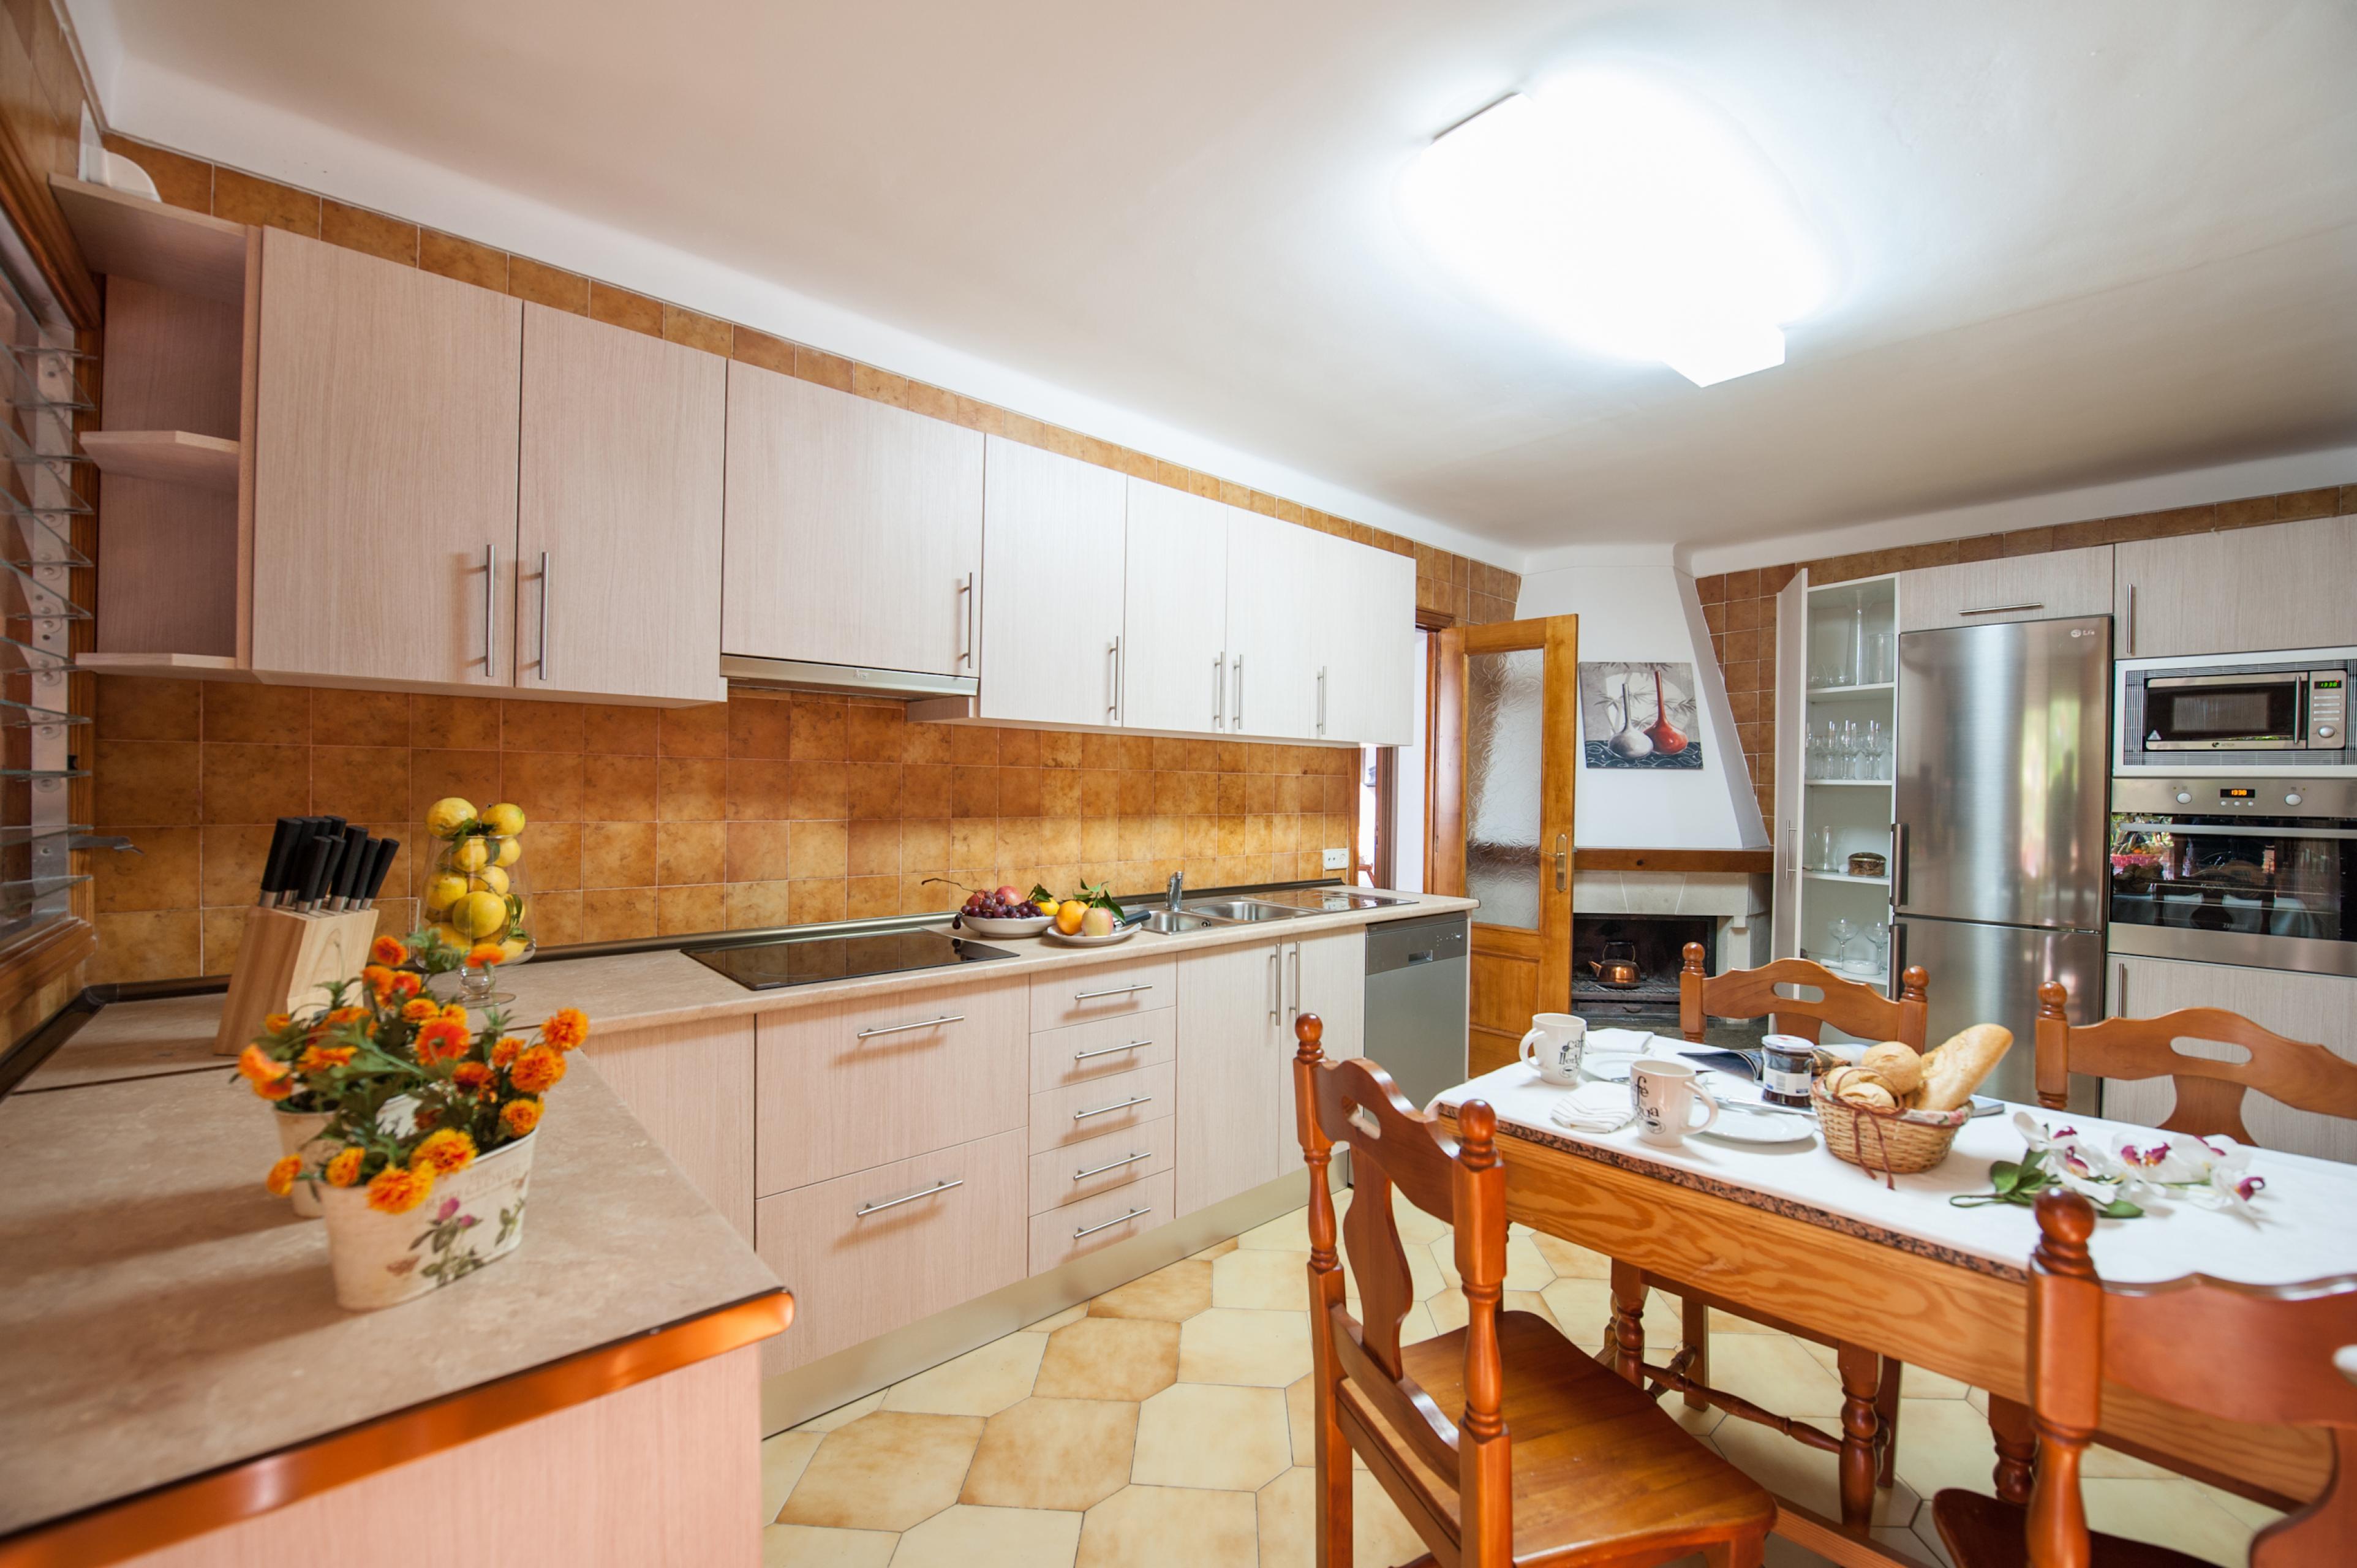 Maison de vacances CA'N LLUC- Alaró- MALLORCA - Kostenloses WLAN (2687507), Alaro, Majorque, Iles Baléares, Espagne, image 18